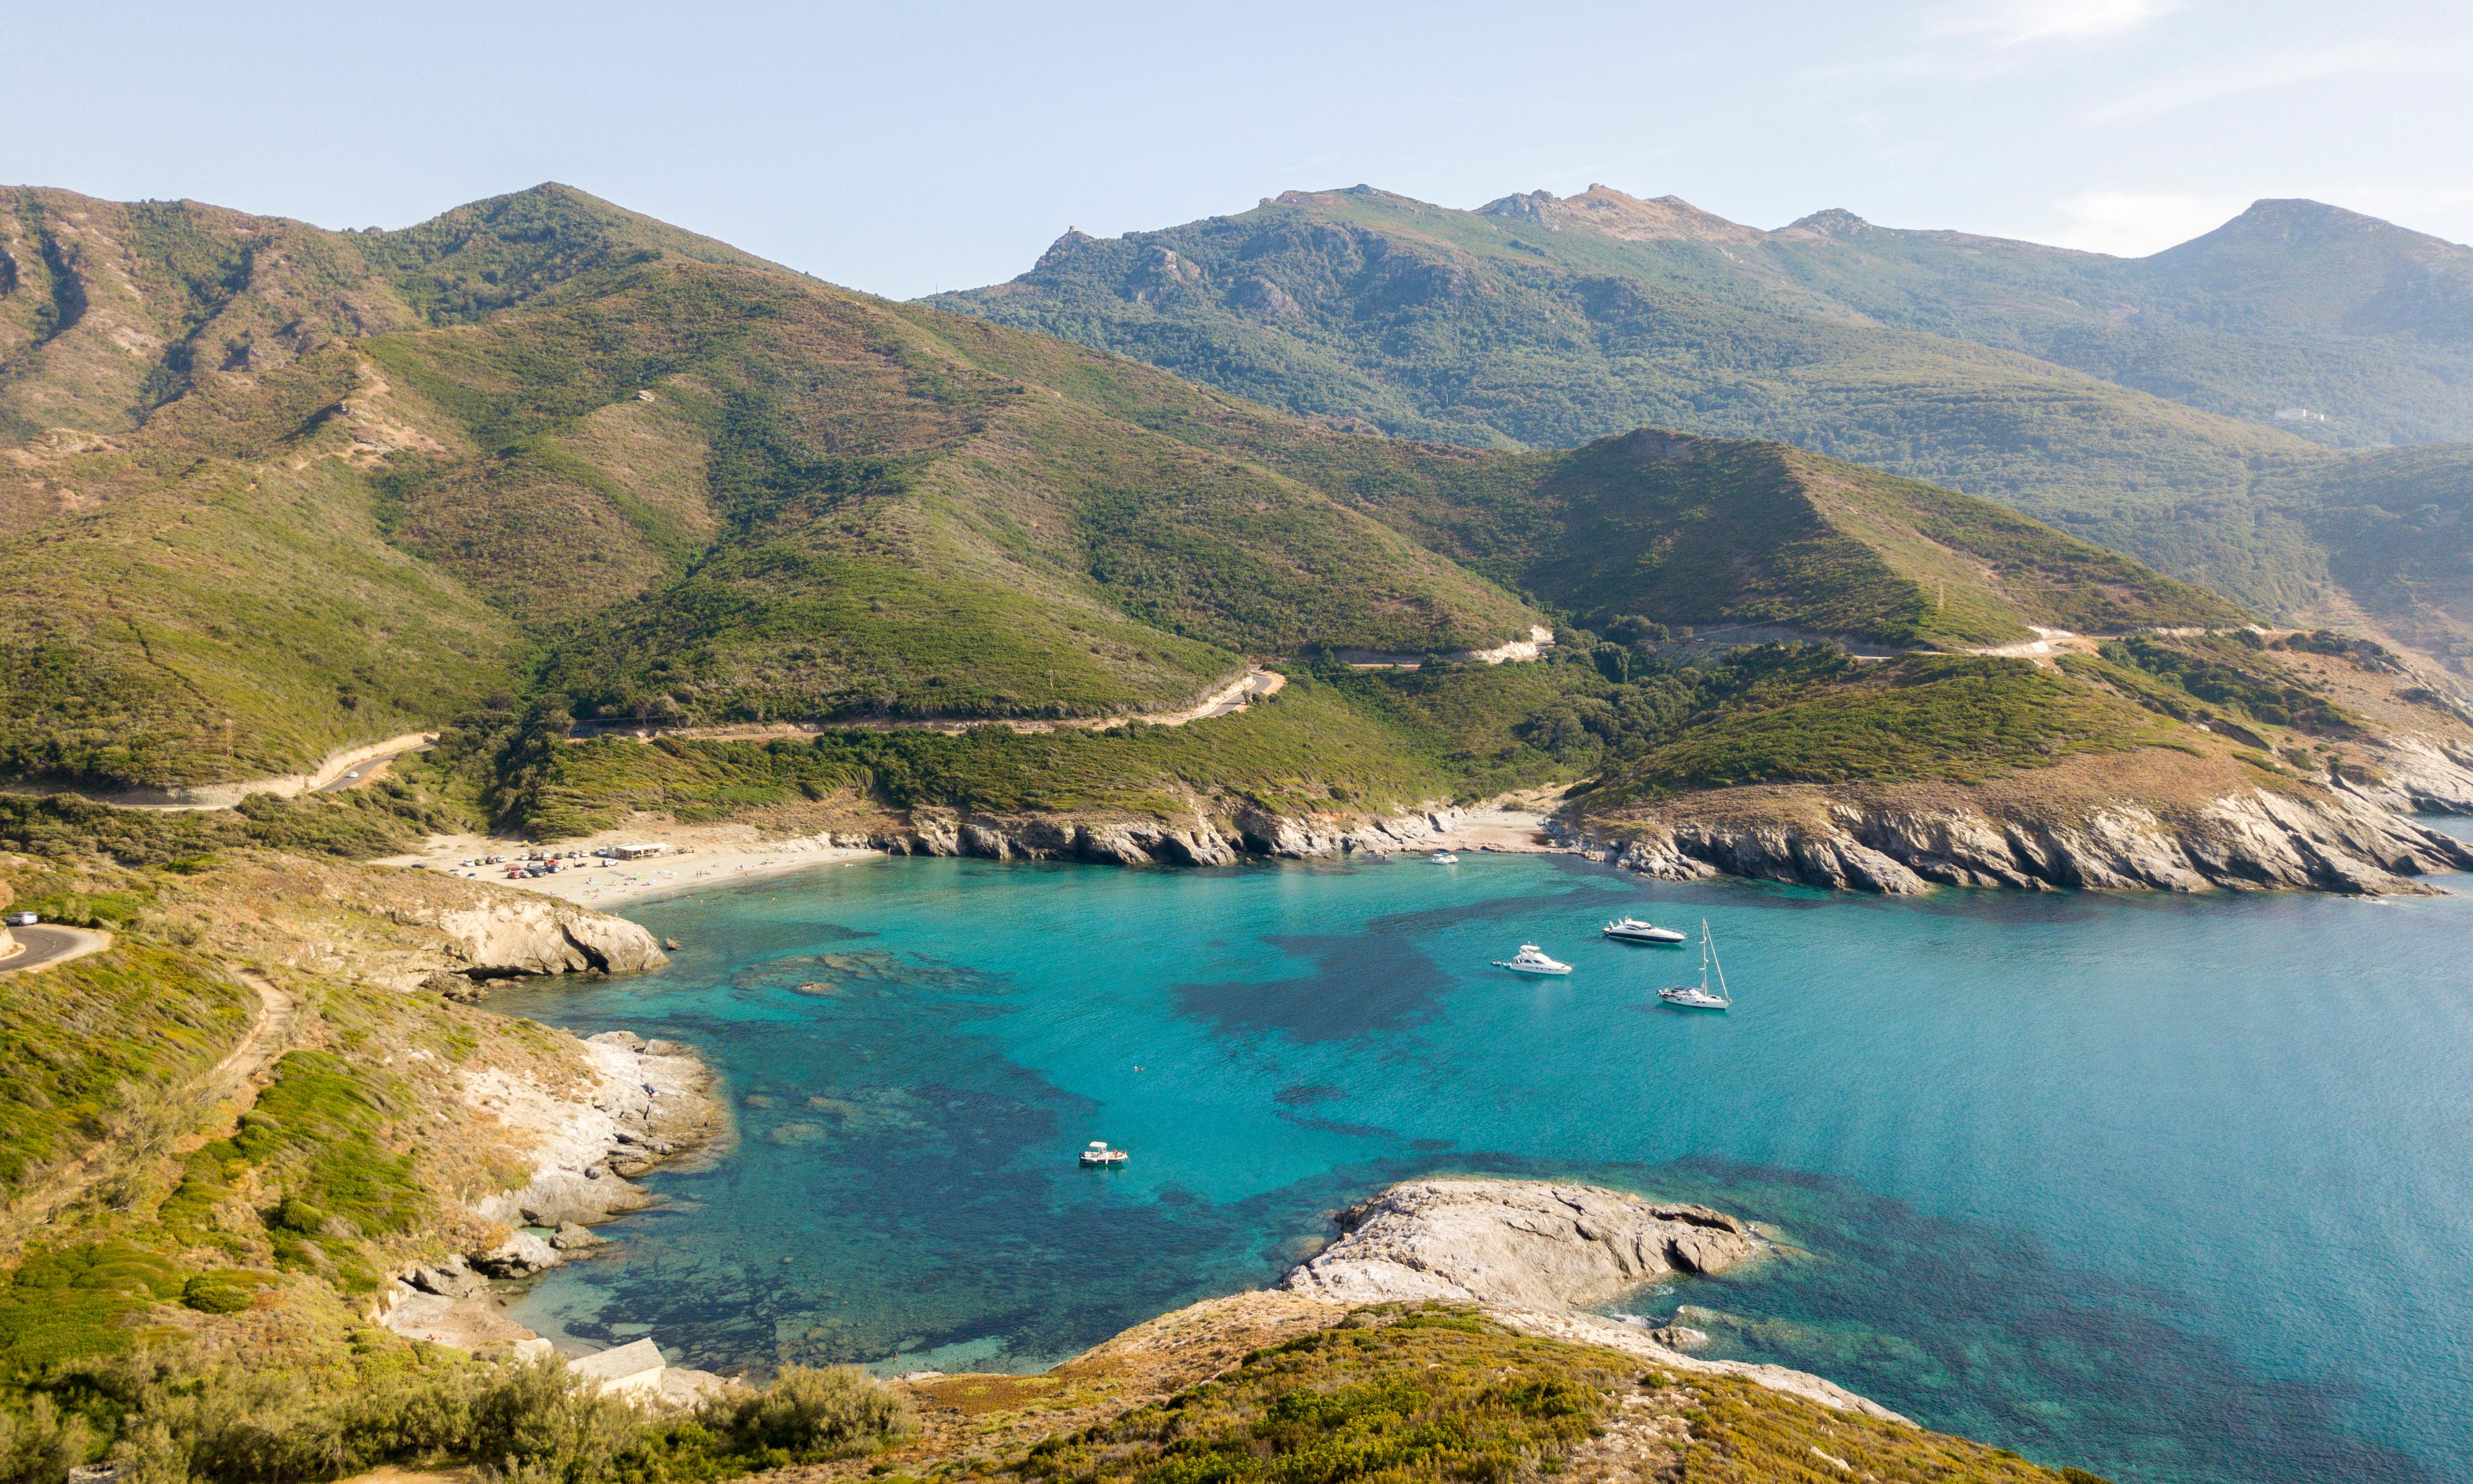 Corsica's cape of good campsites